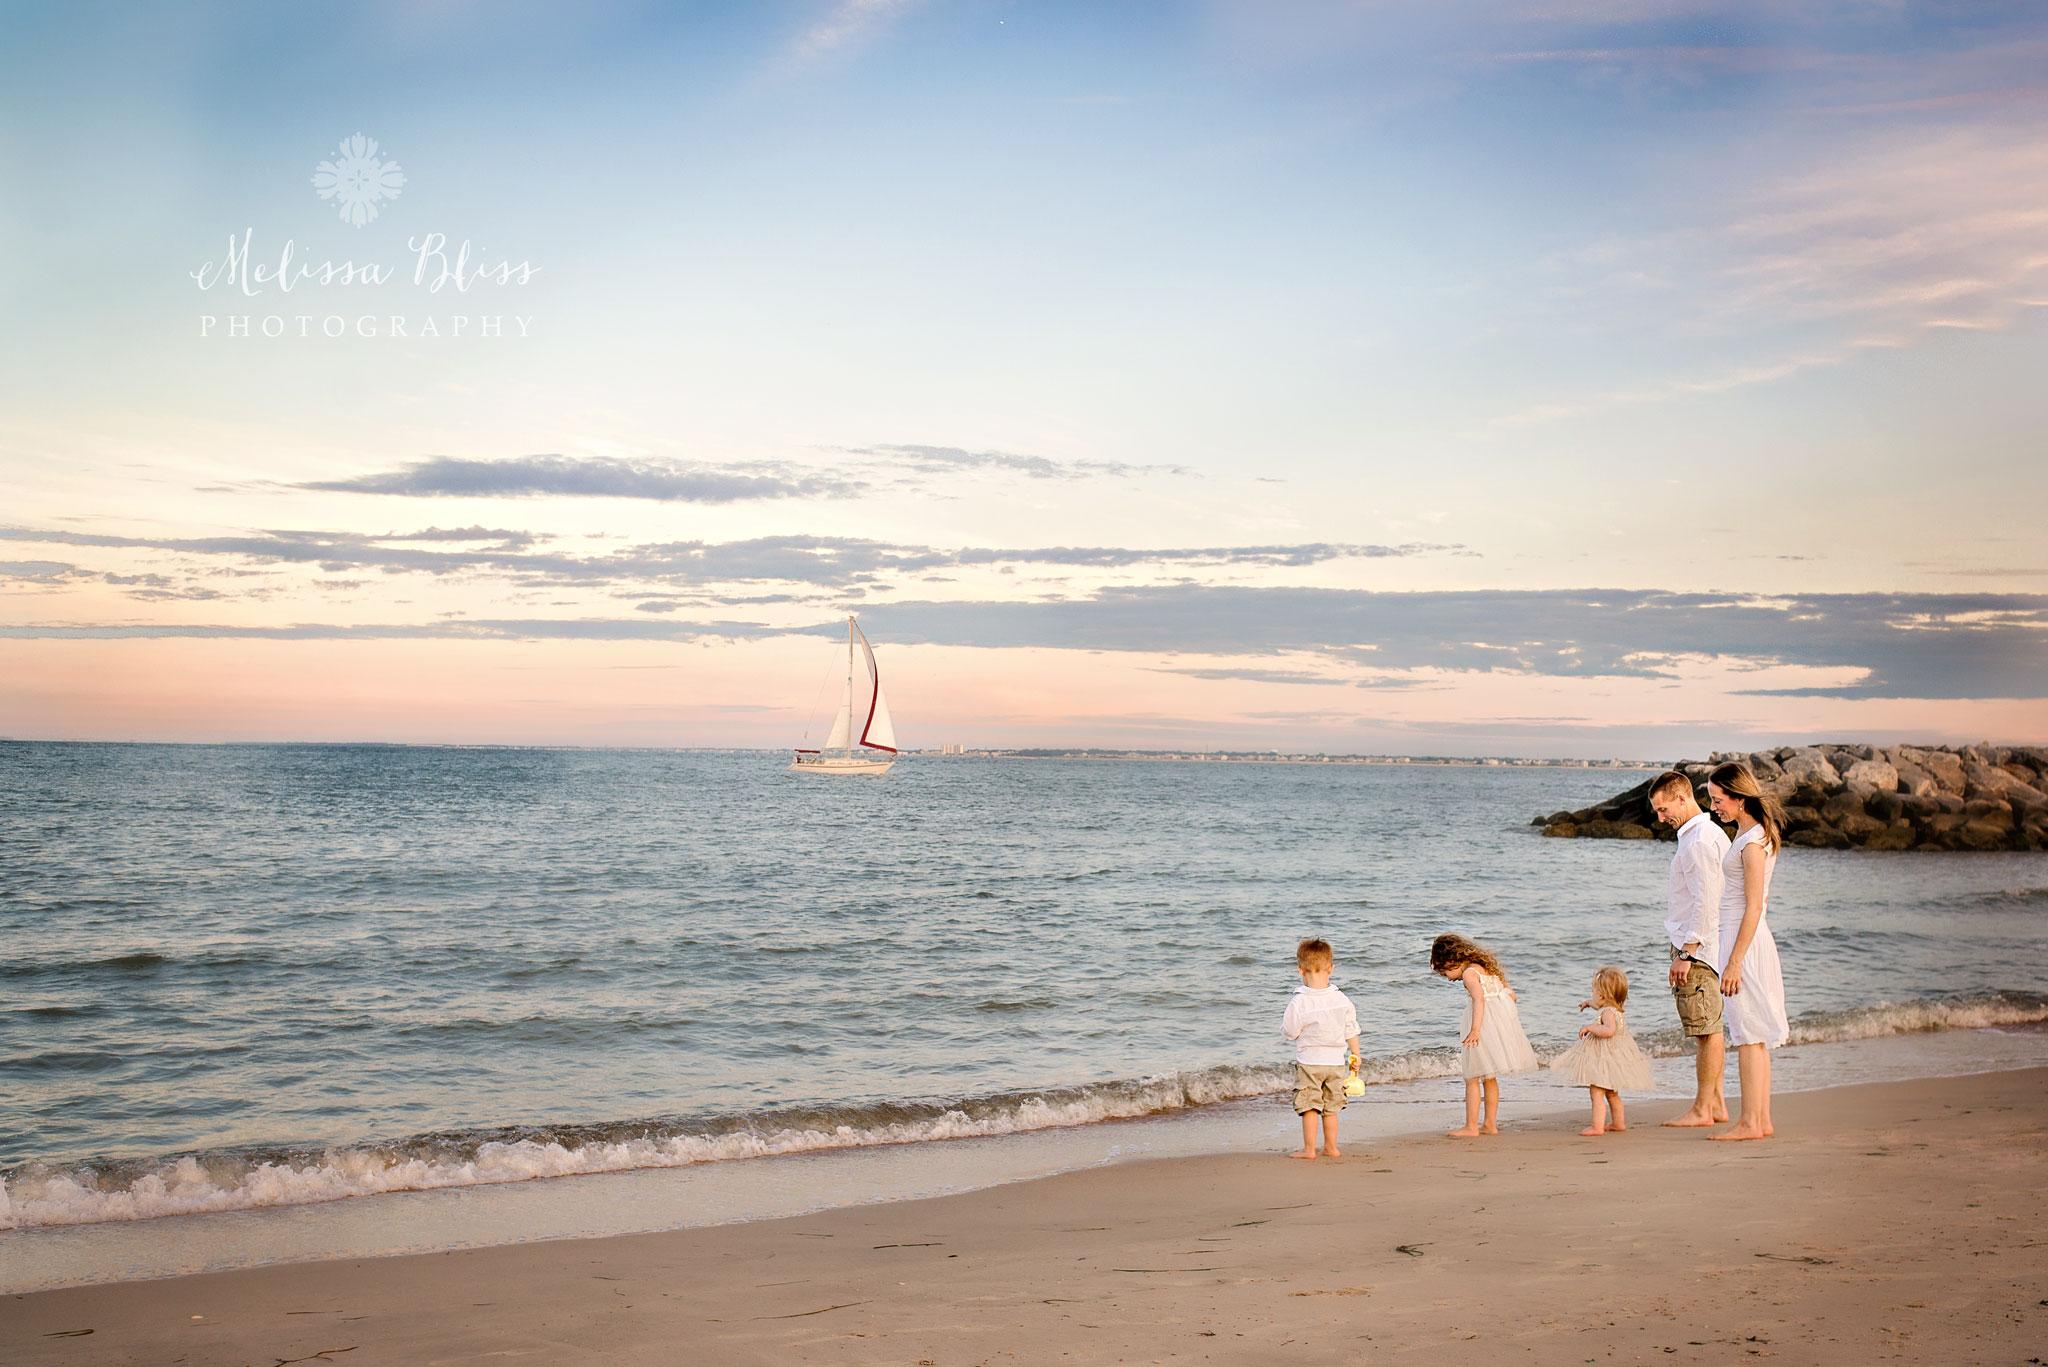 sandbridge-virginia-beach-professsional-family-photographer-melissa-bliss-photography-top-virginia-beach-photographers